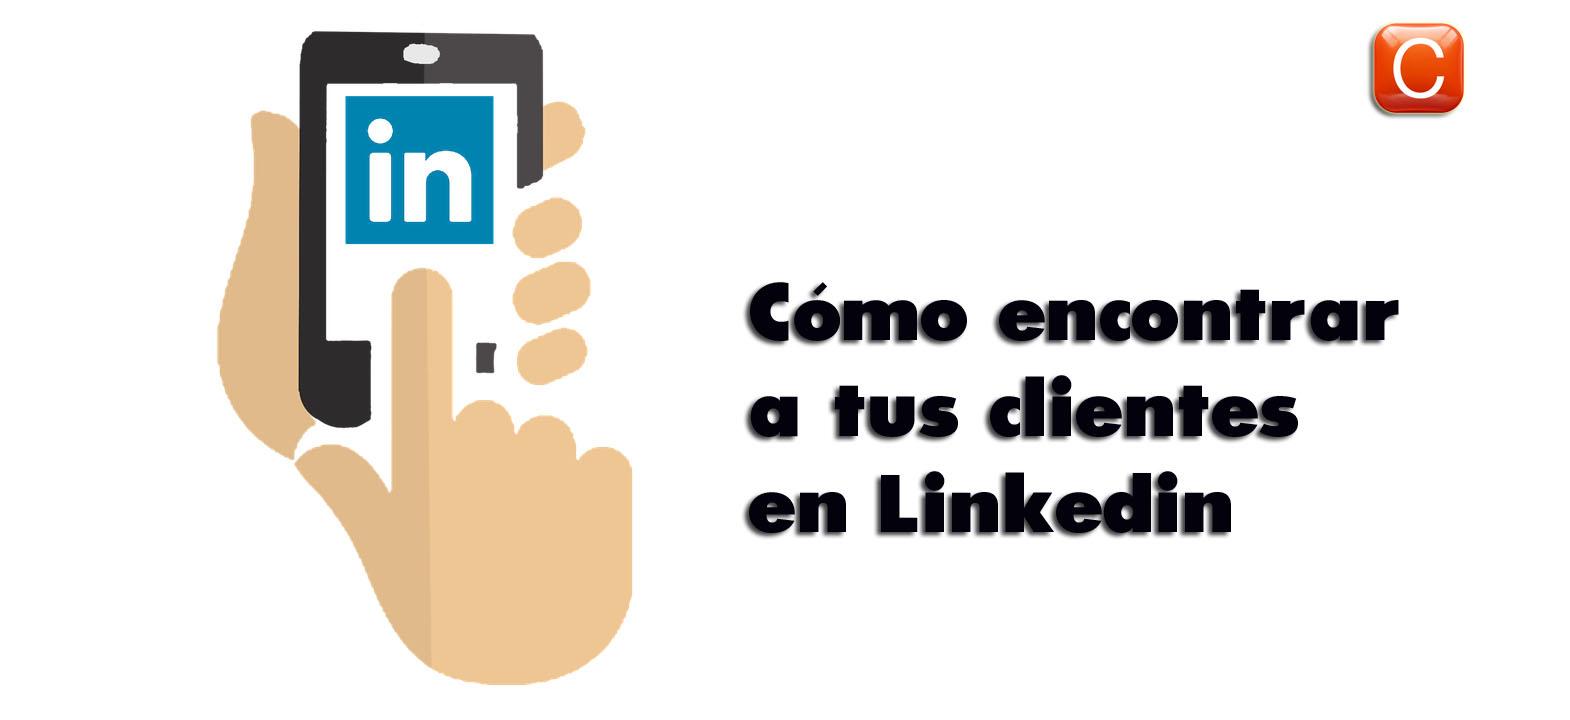 como encontrar a tus clientes en Linkedin community internet